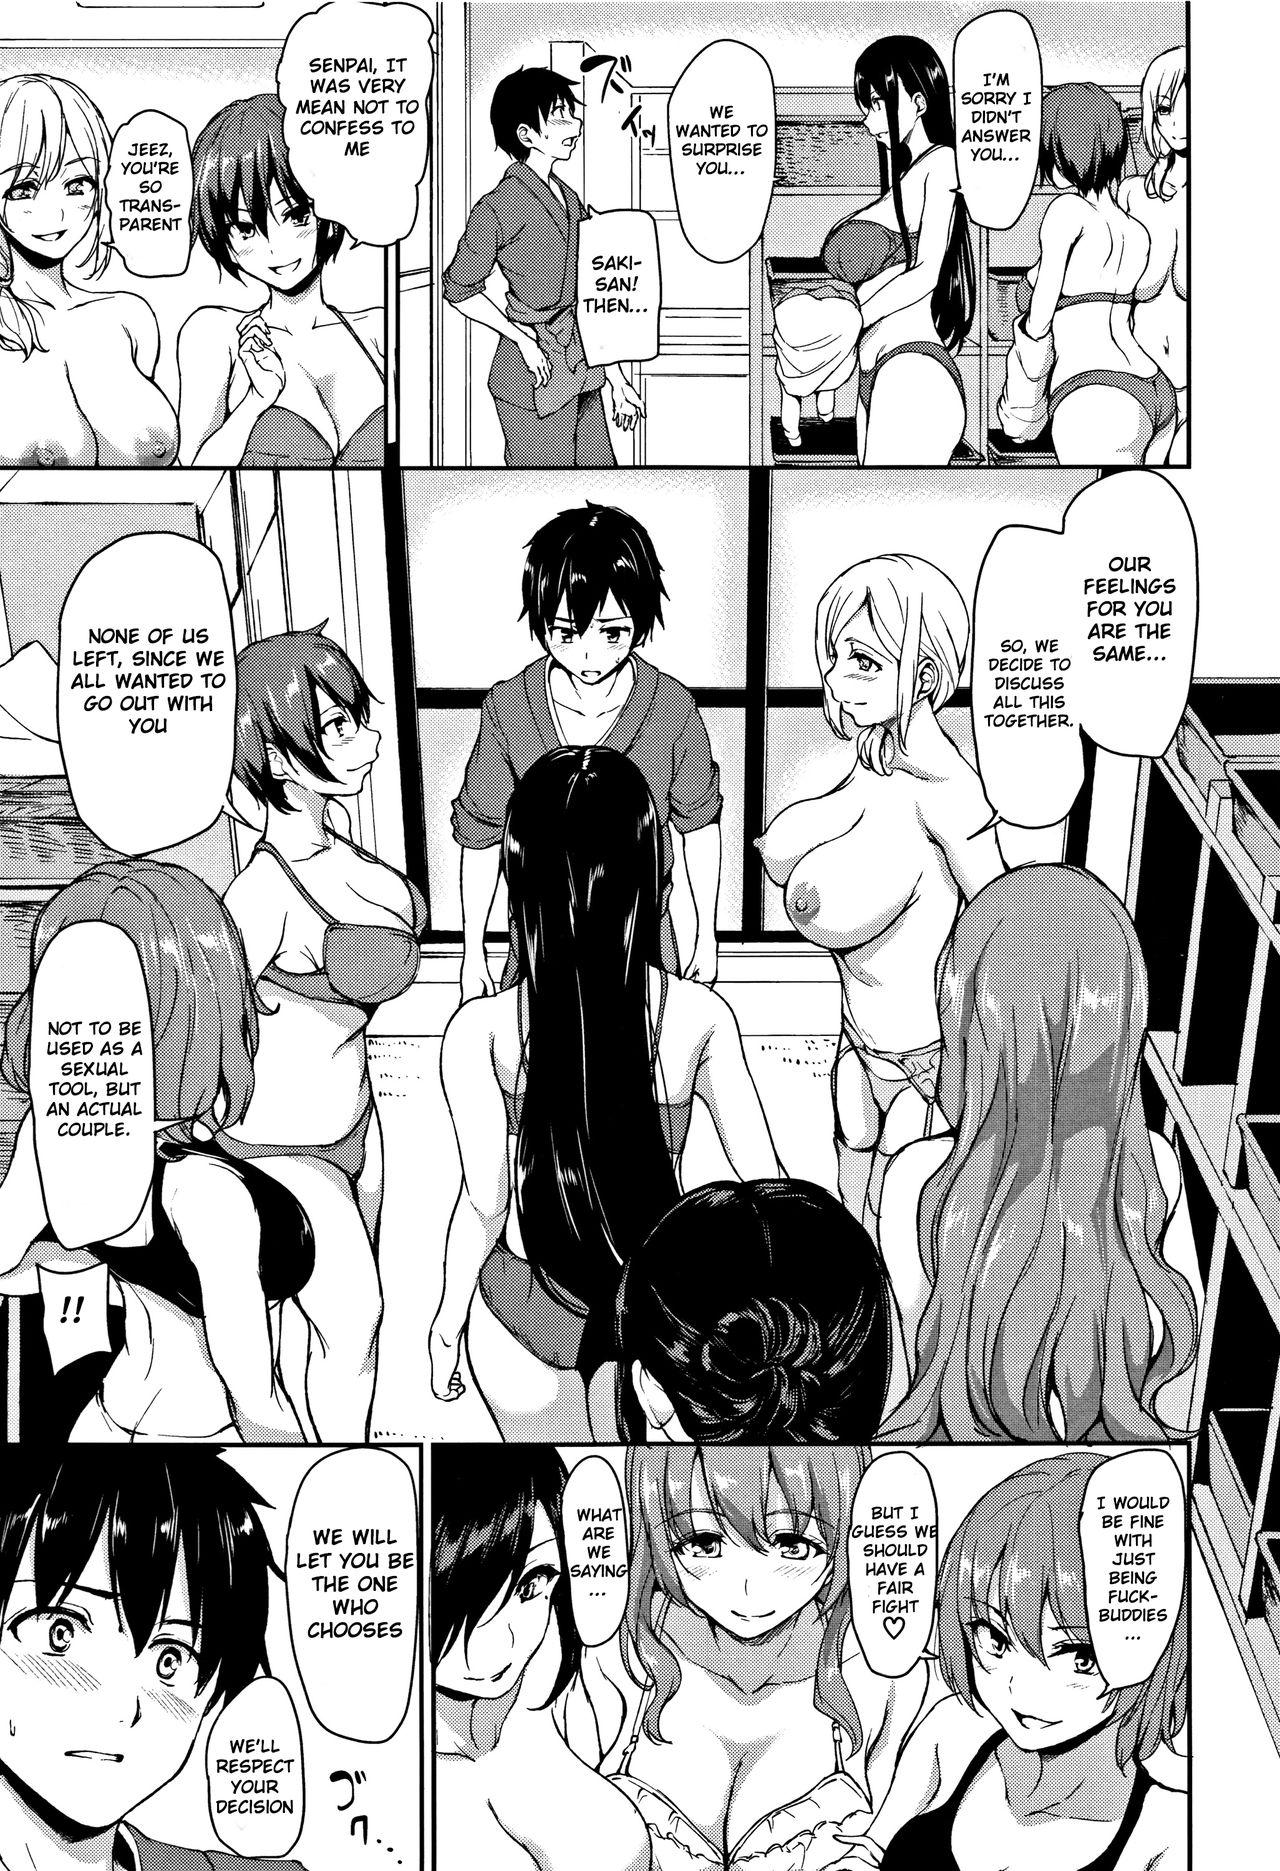 Yukemuri Harem Monogatari Saishuuwa | Yukemuri Harem Monogatari Final Chapter 6